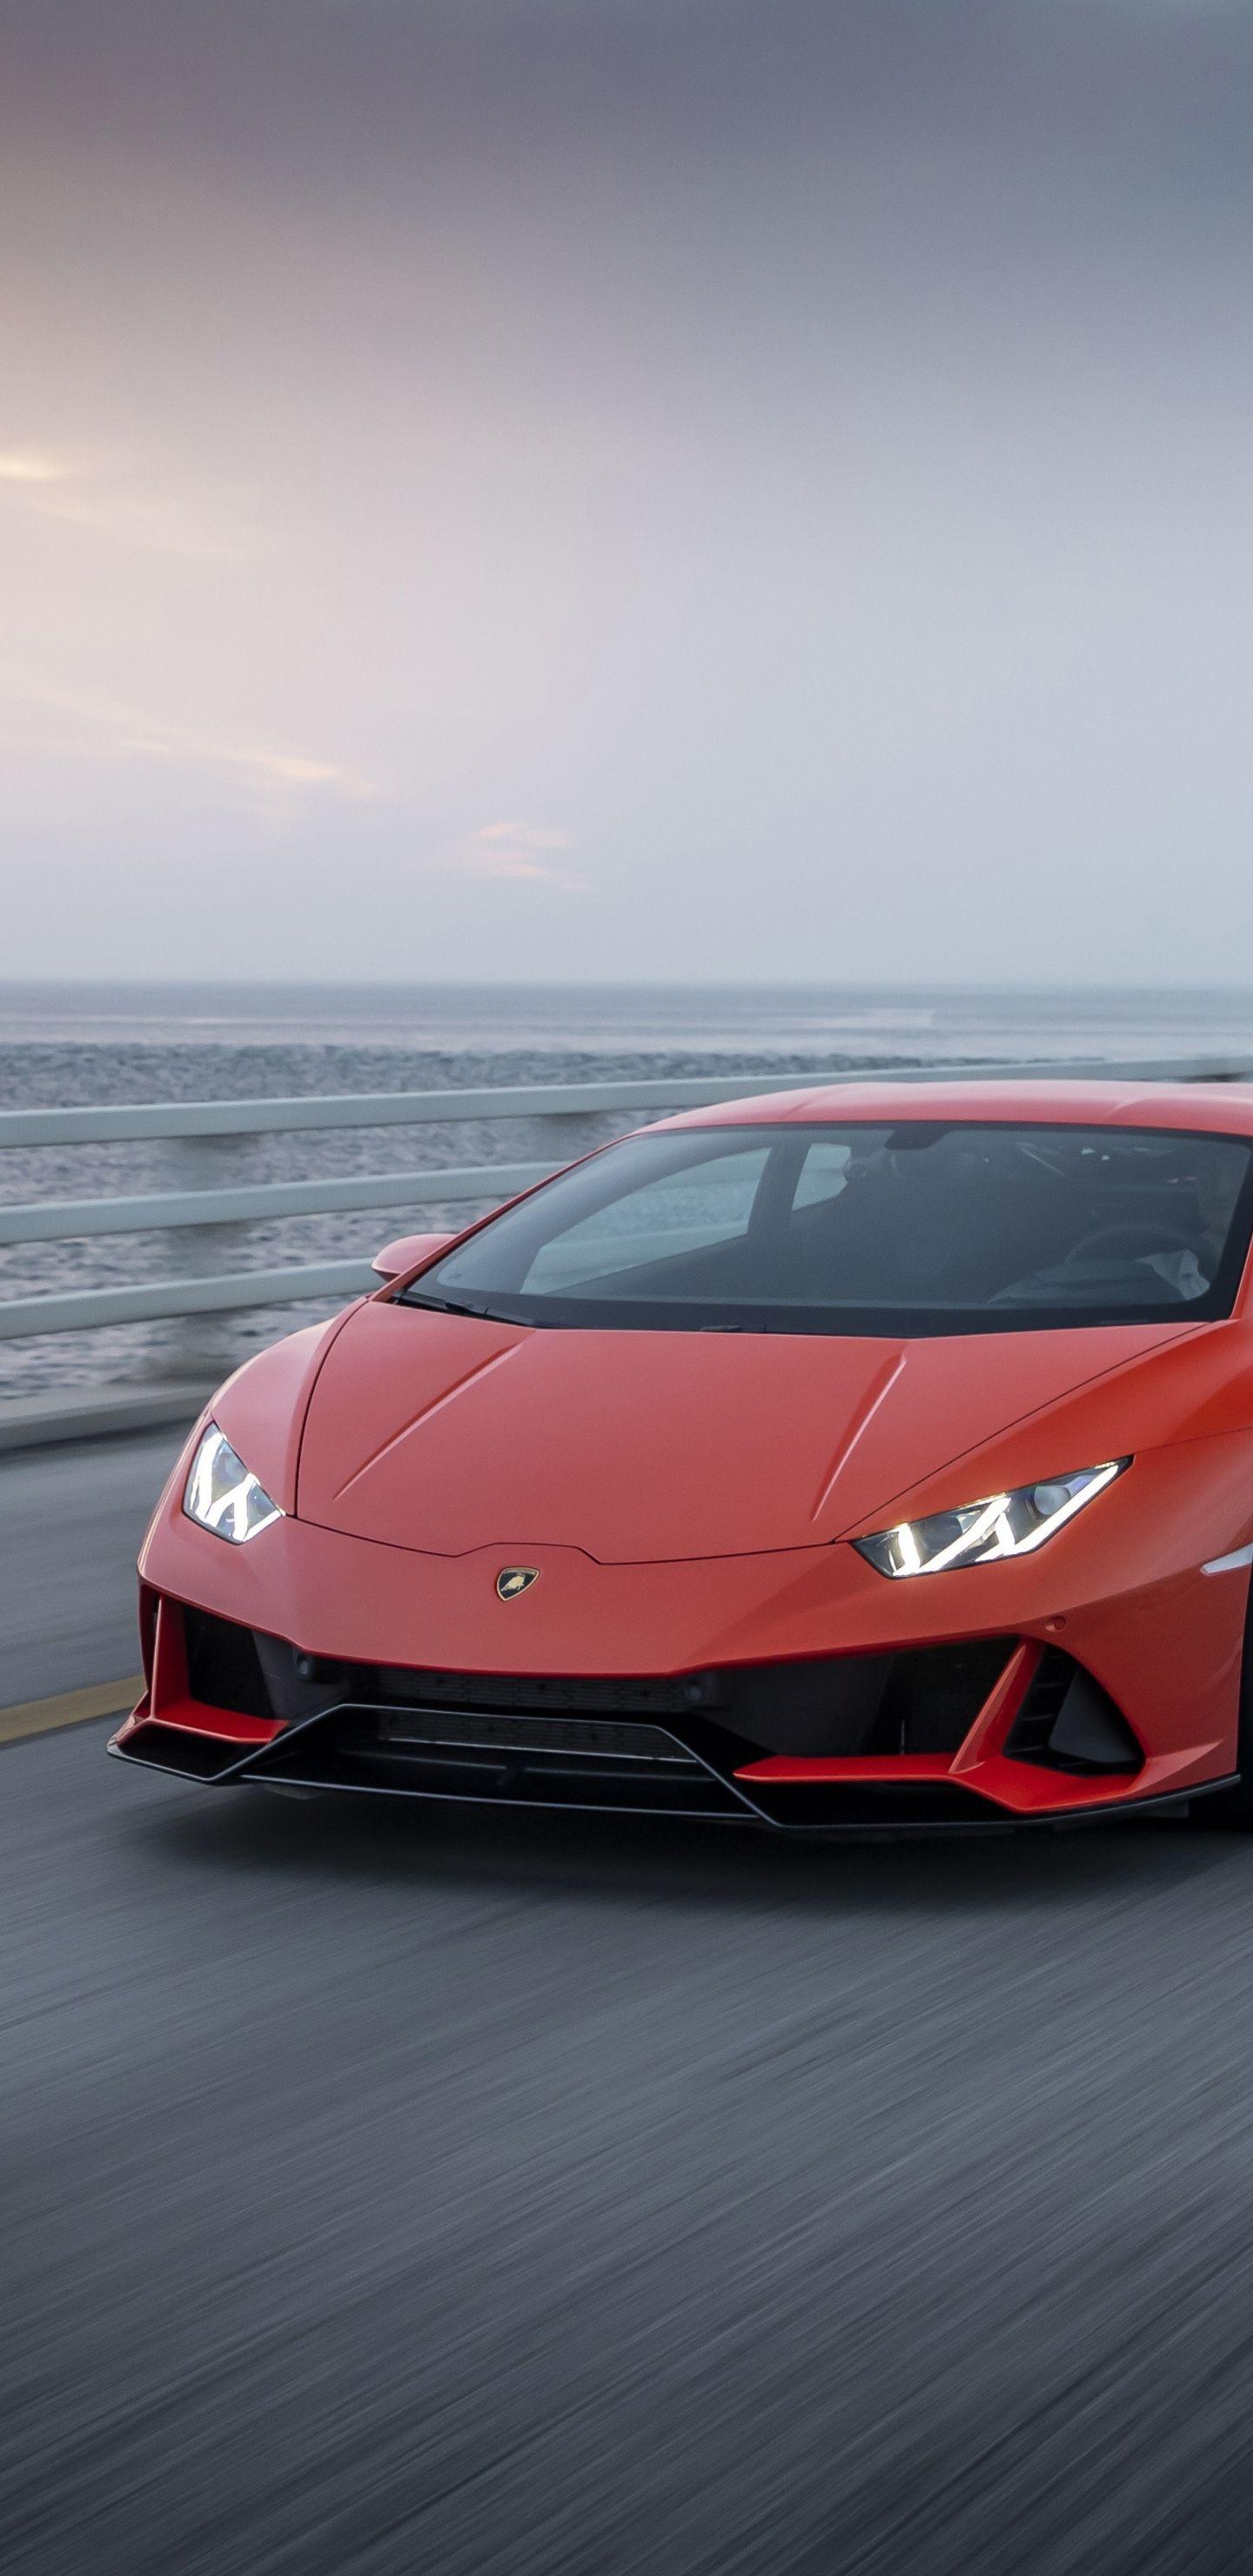 1440x2960 Red Car Lamborghini Huracan Sportcar Wallpaper Lamborghini Huracan Lamborghini Red Lamborghini